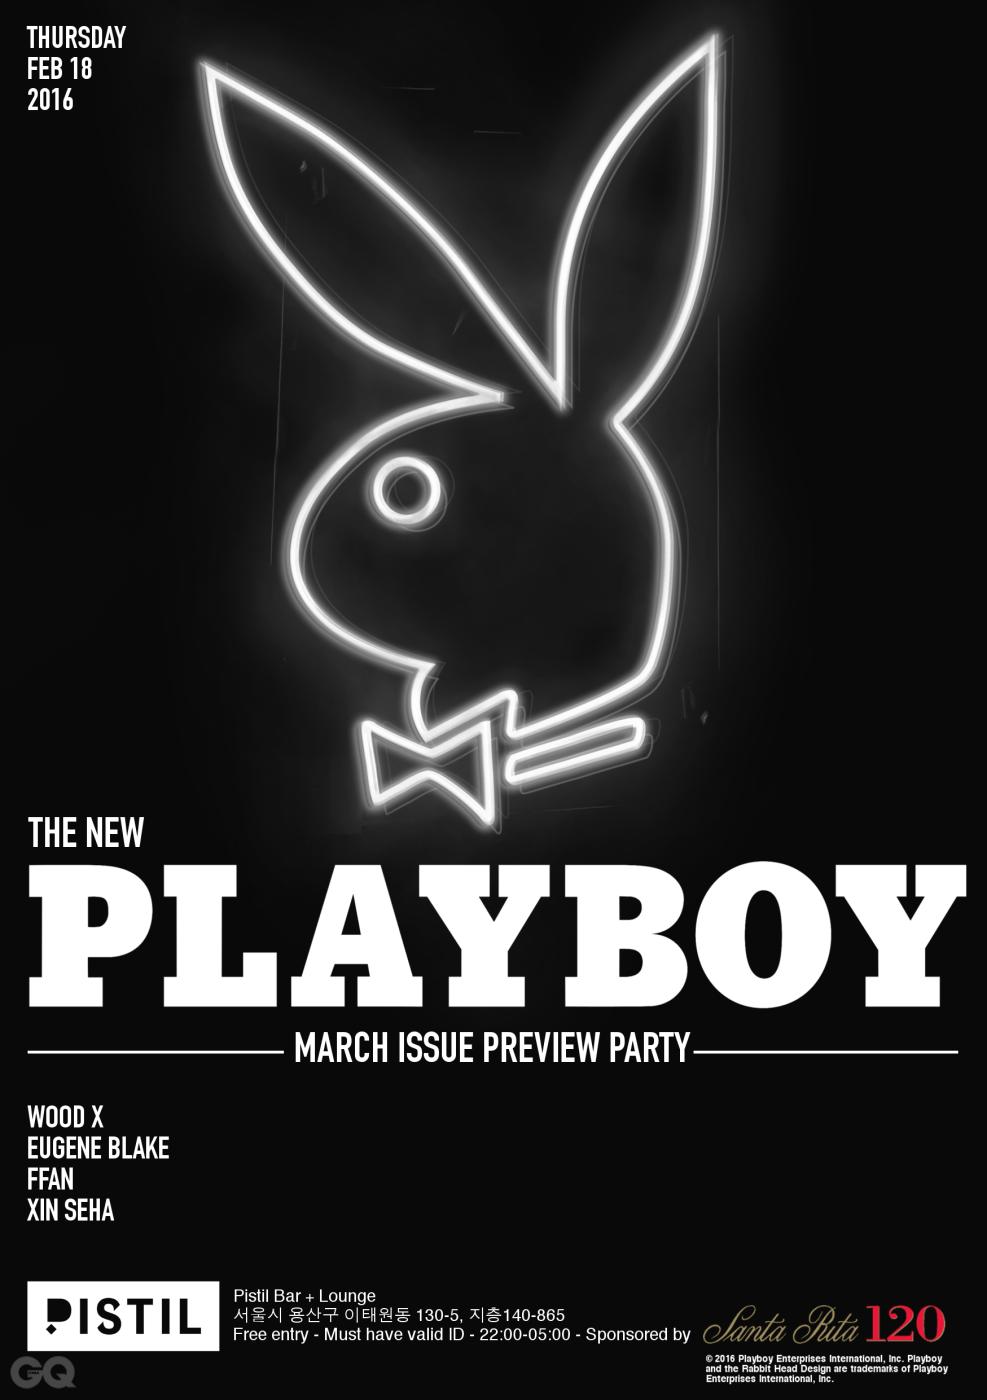 Playboy Magazine finalwhiteposter